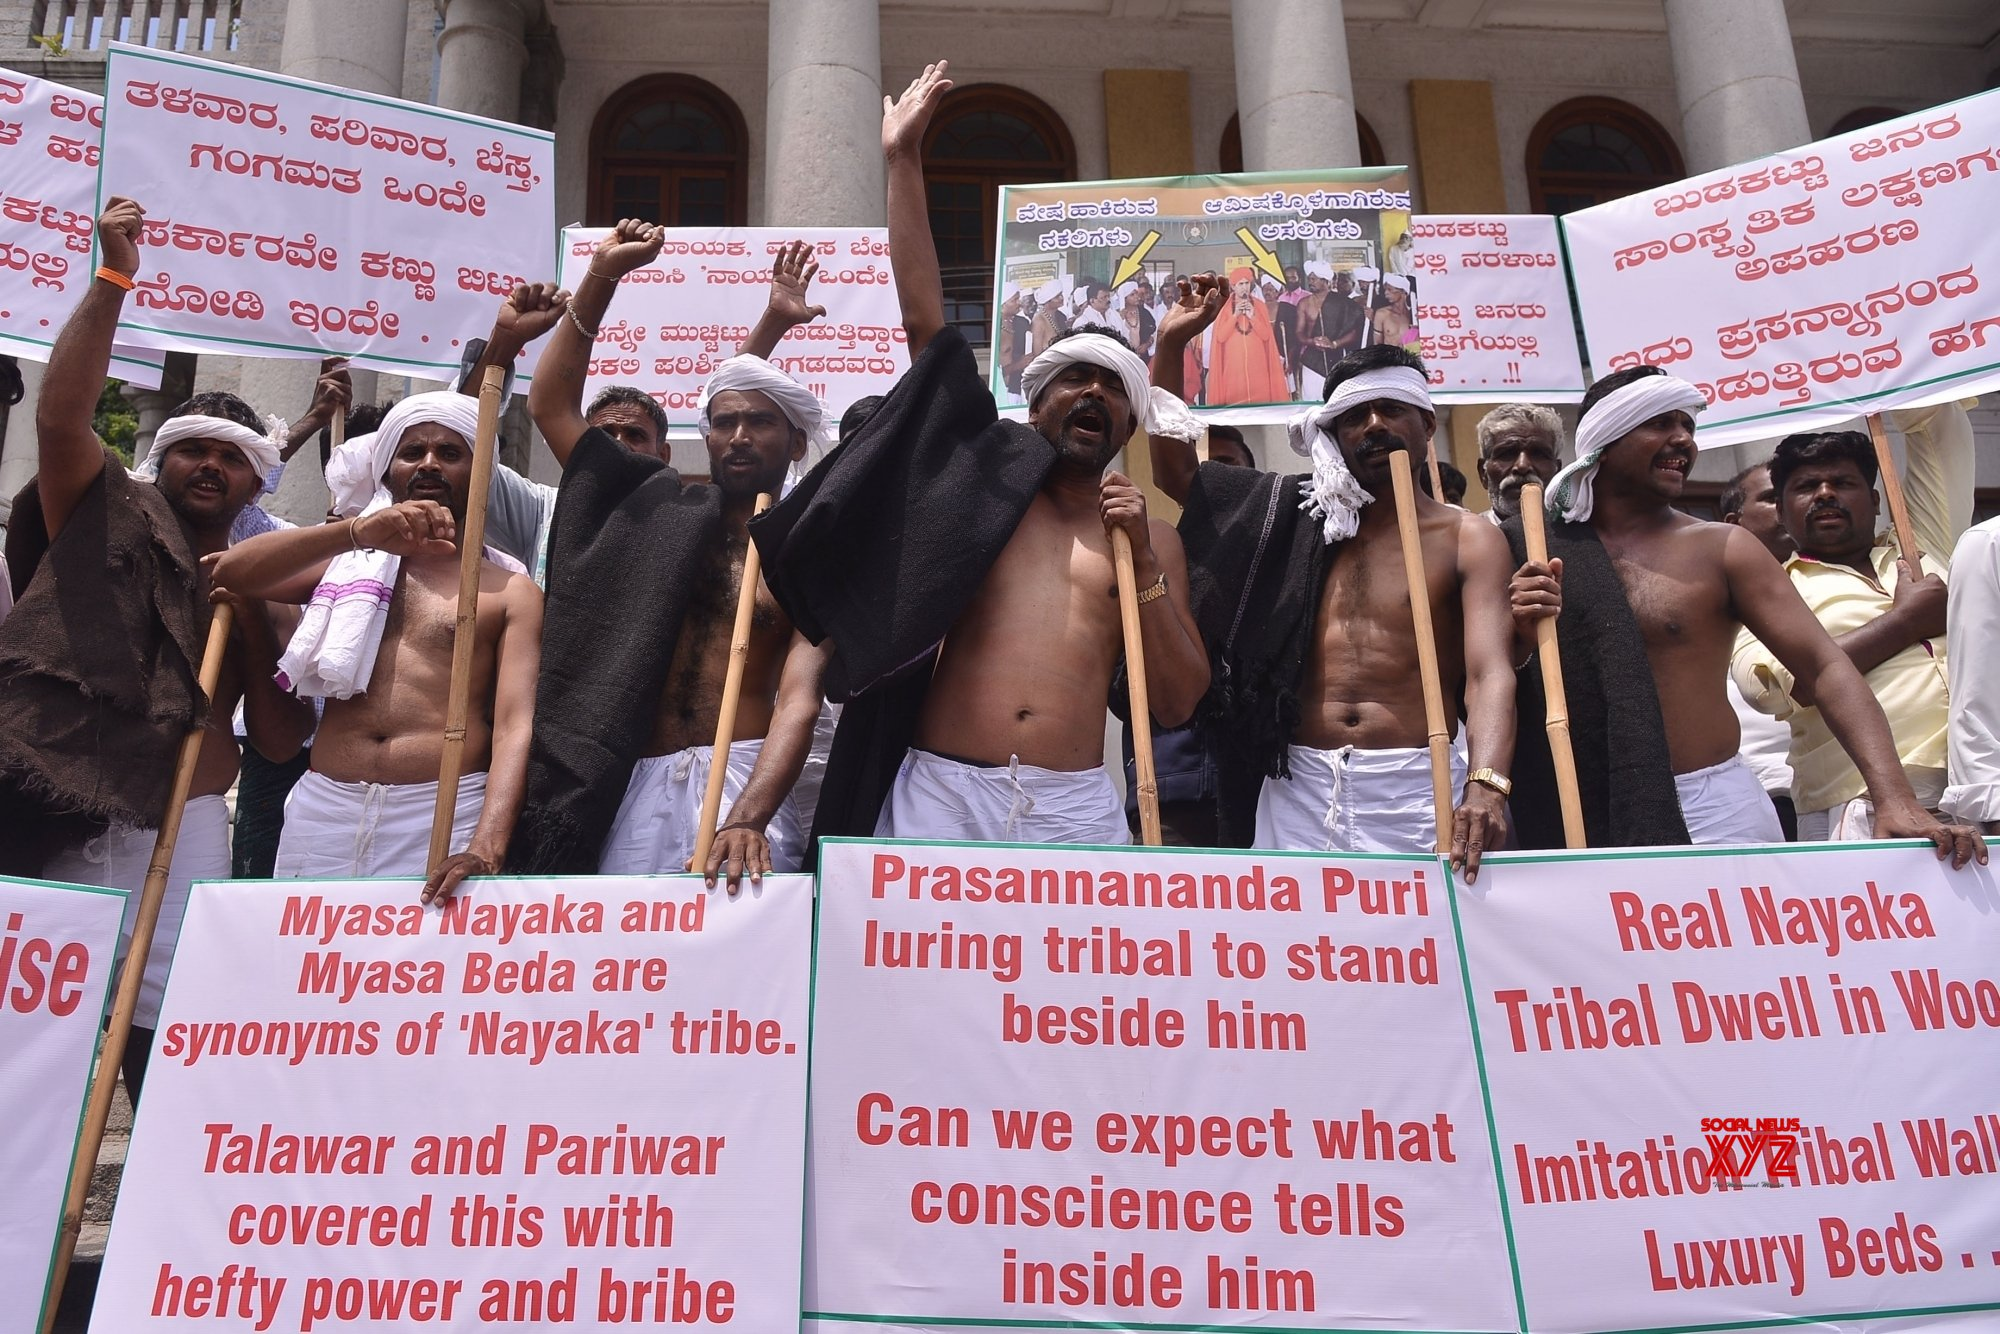 Bengaluru: Protest against Prasannananda Puri #Gallery